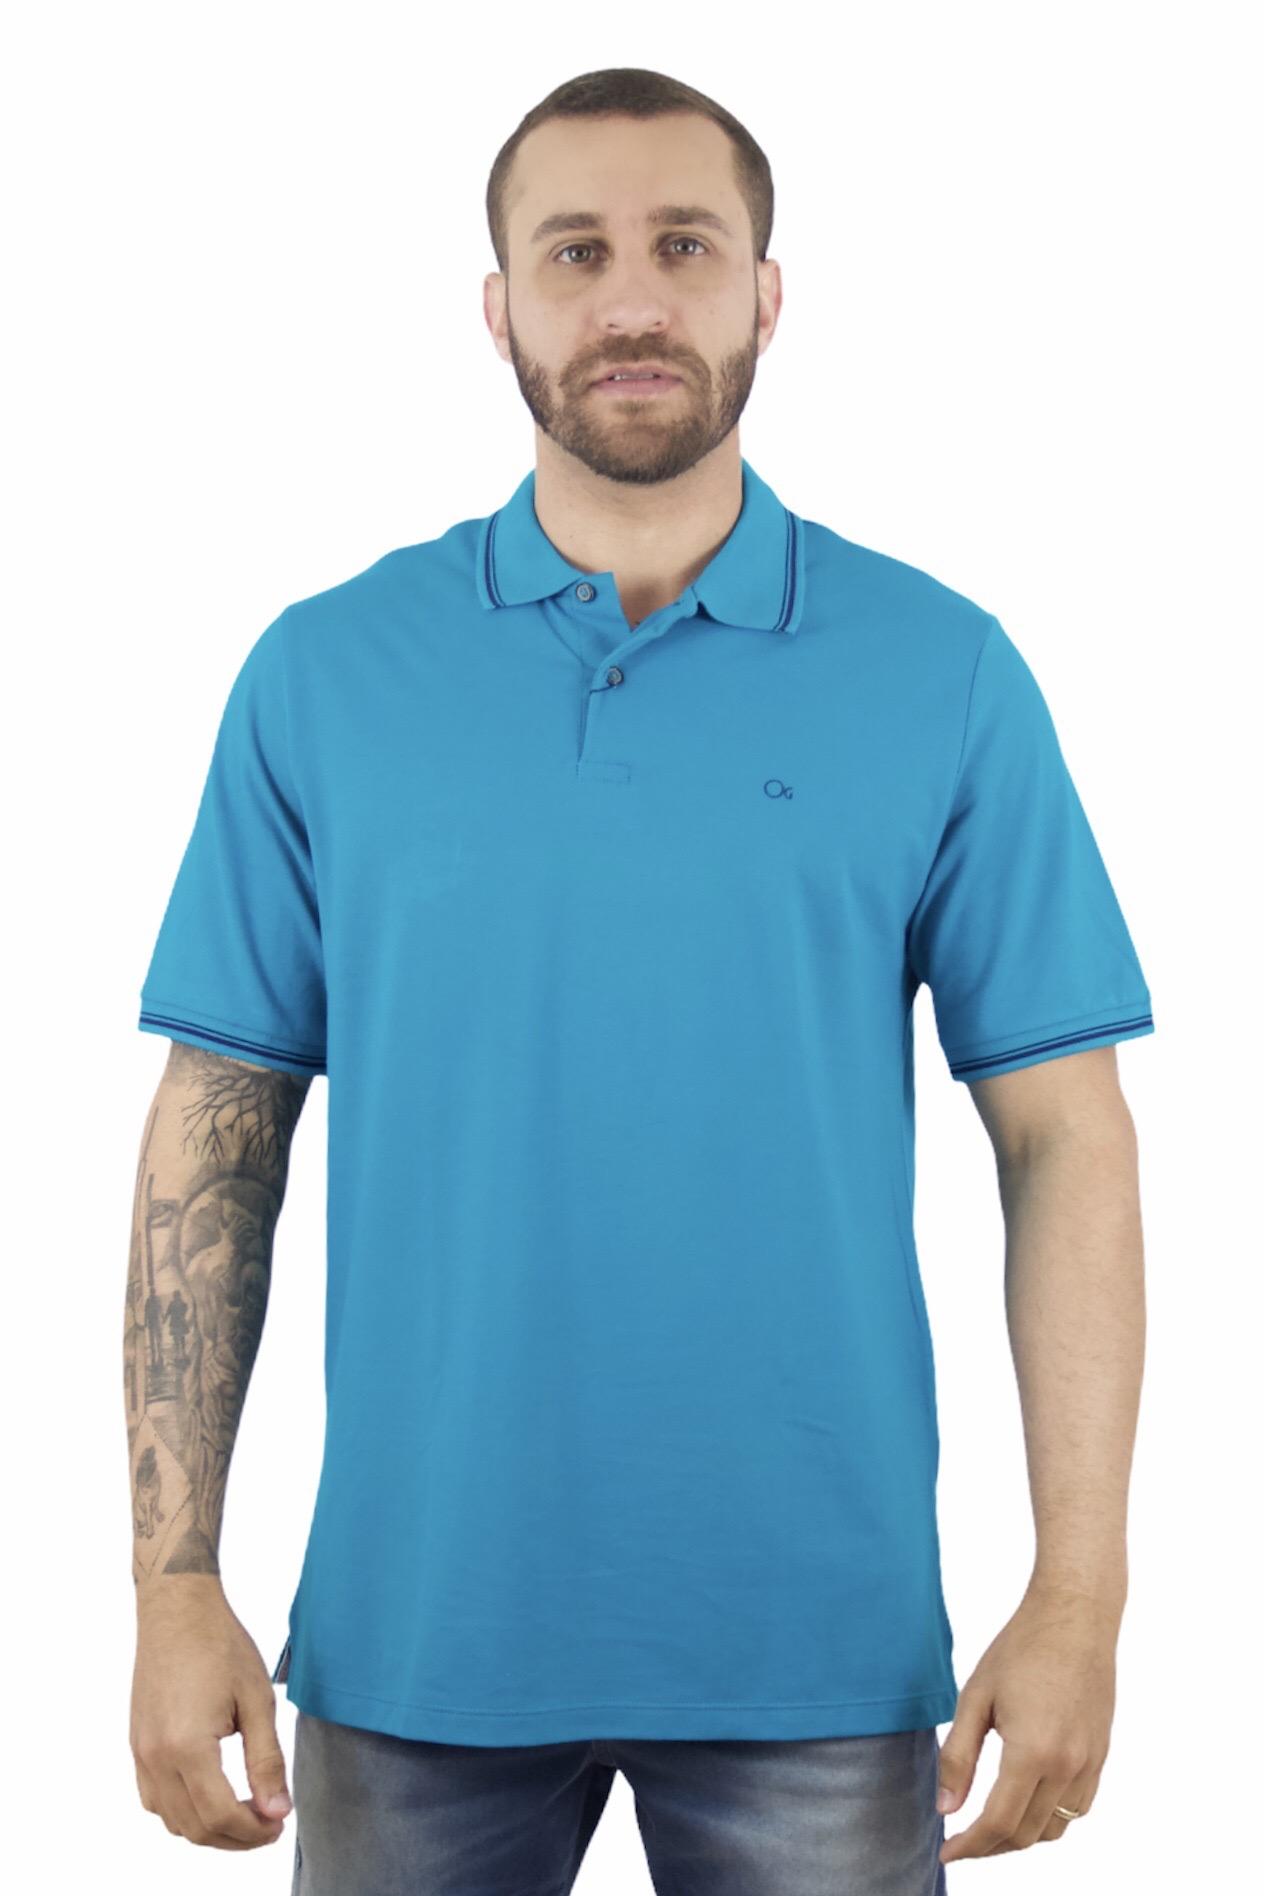 Camisa Polo Ogochi Mc Special Slim Pique 7008